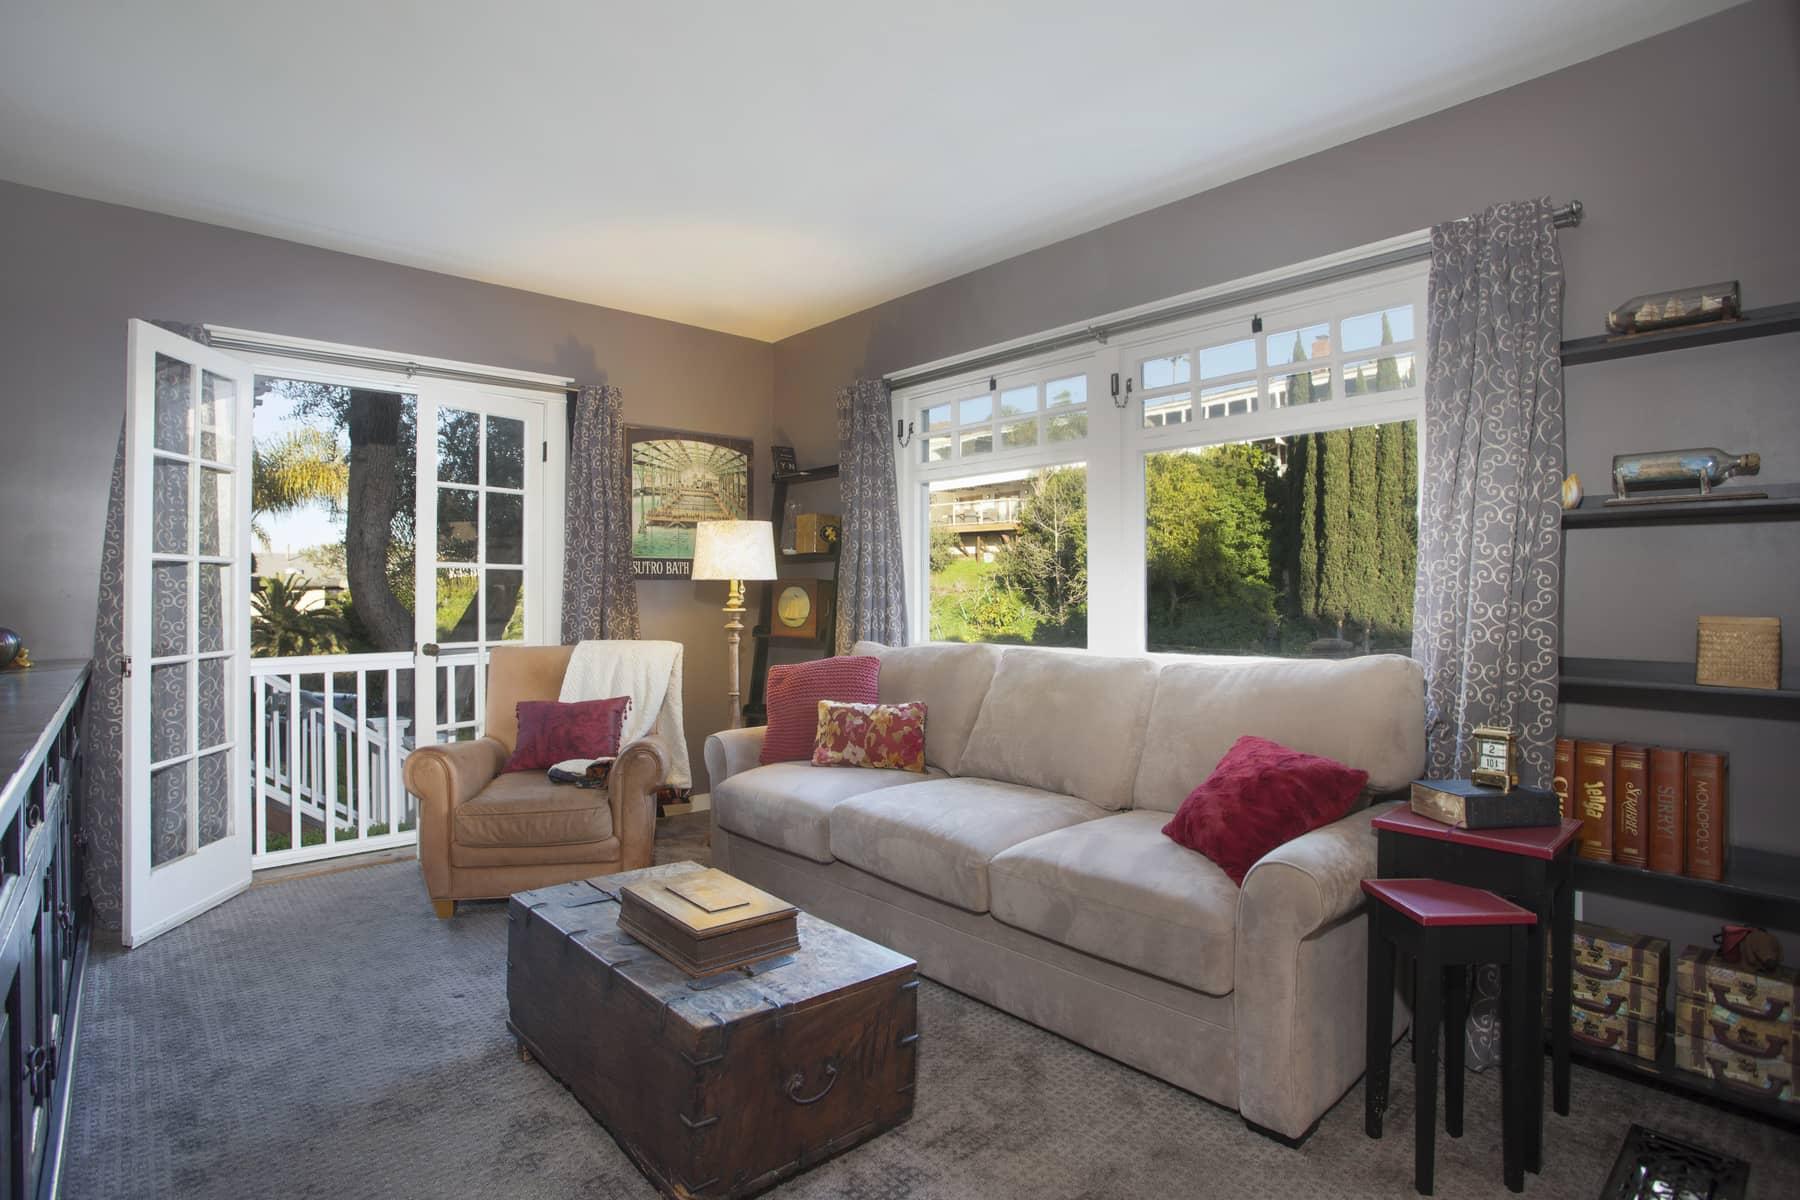 235 Fowling St,Playa Del Rey,California,3 Bedrooms Bedrooms,3 BathroomsBathrooms,Home,Fowling St,1022